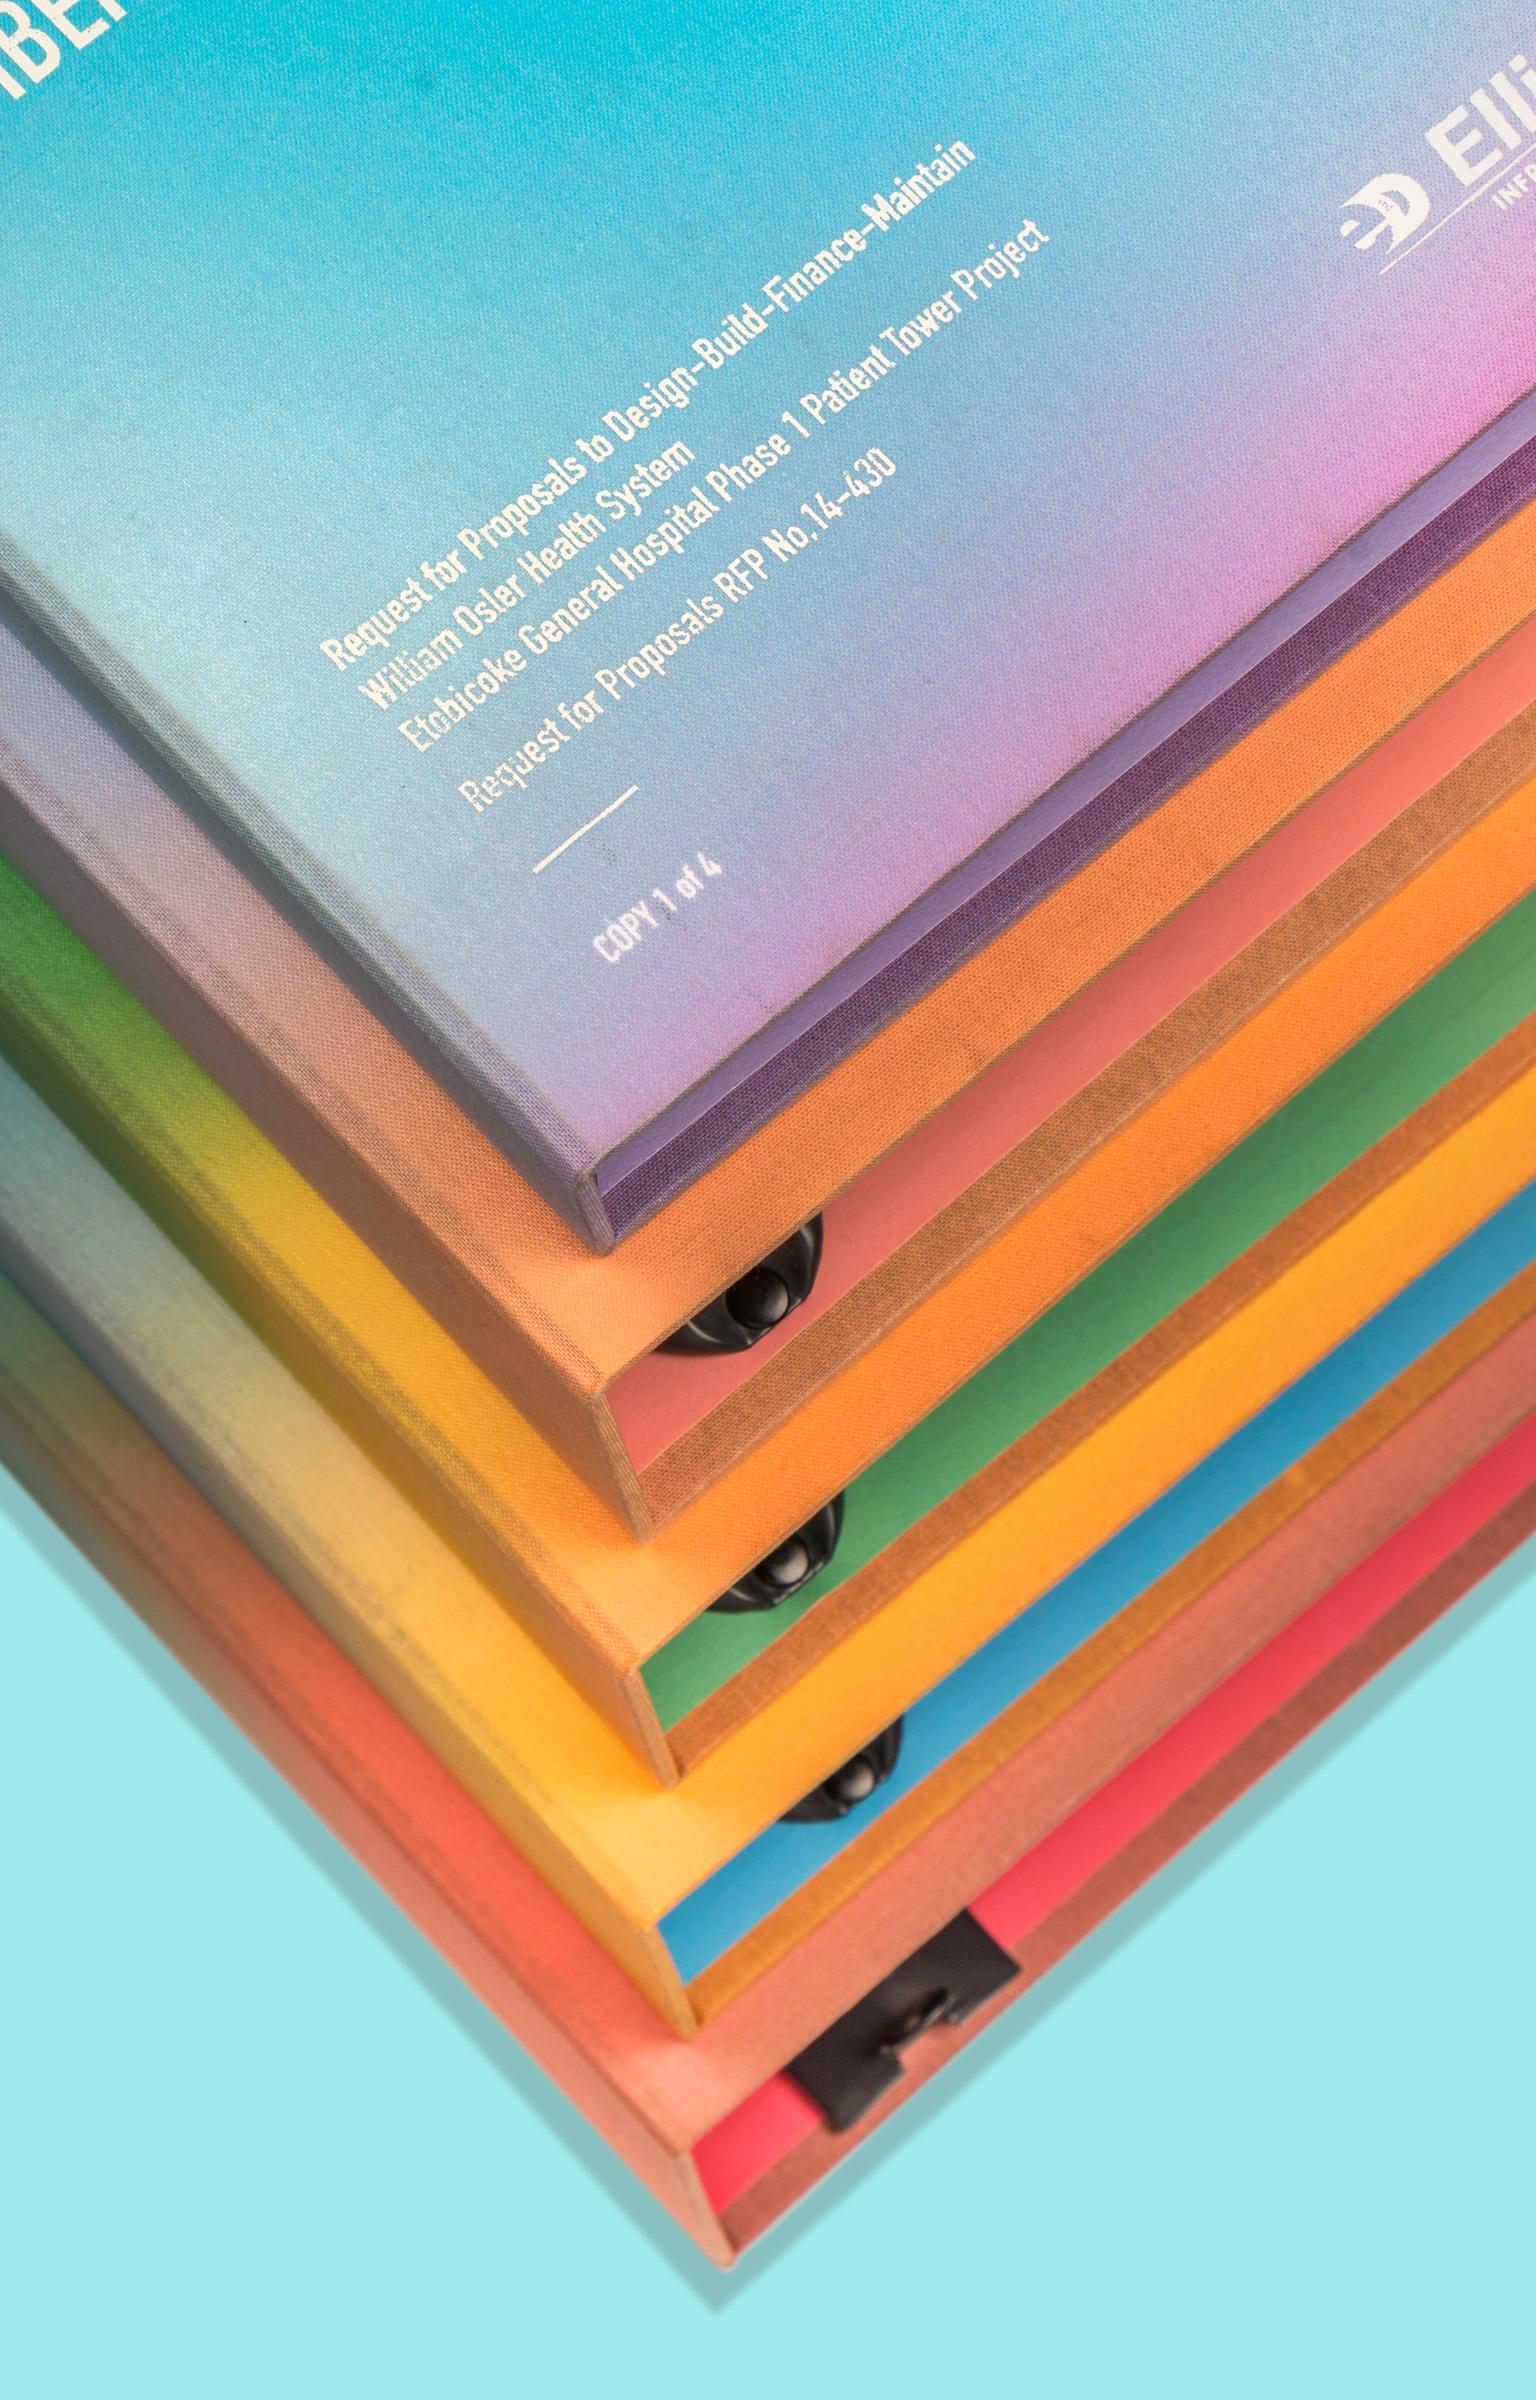 Gas Company EGH colour vignette three ring binders4.jpg